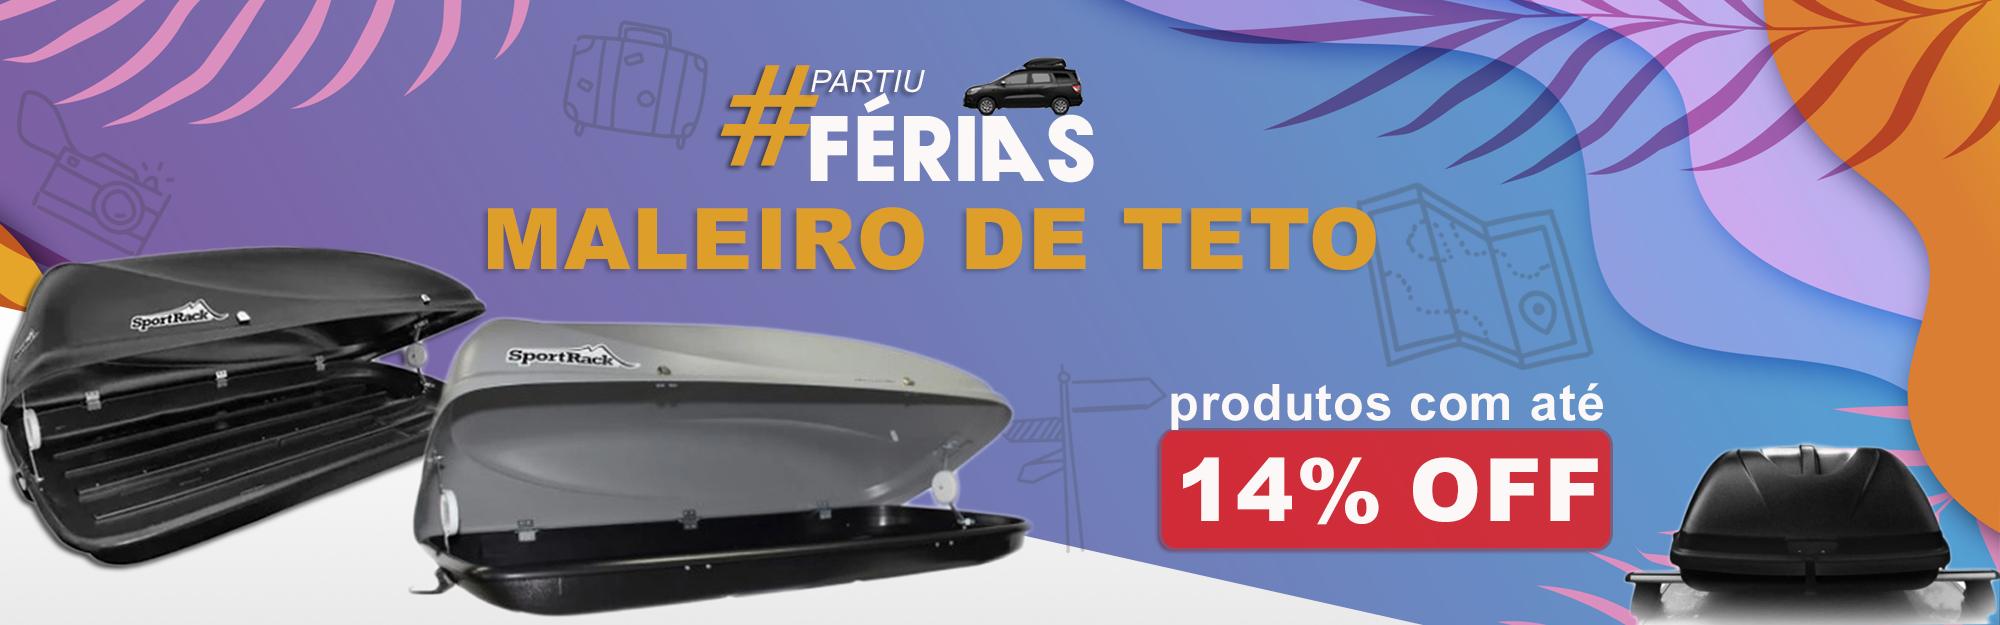 FERIAS - MALEIRO